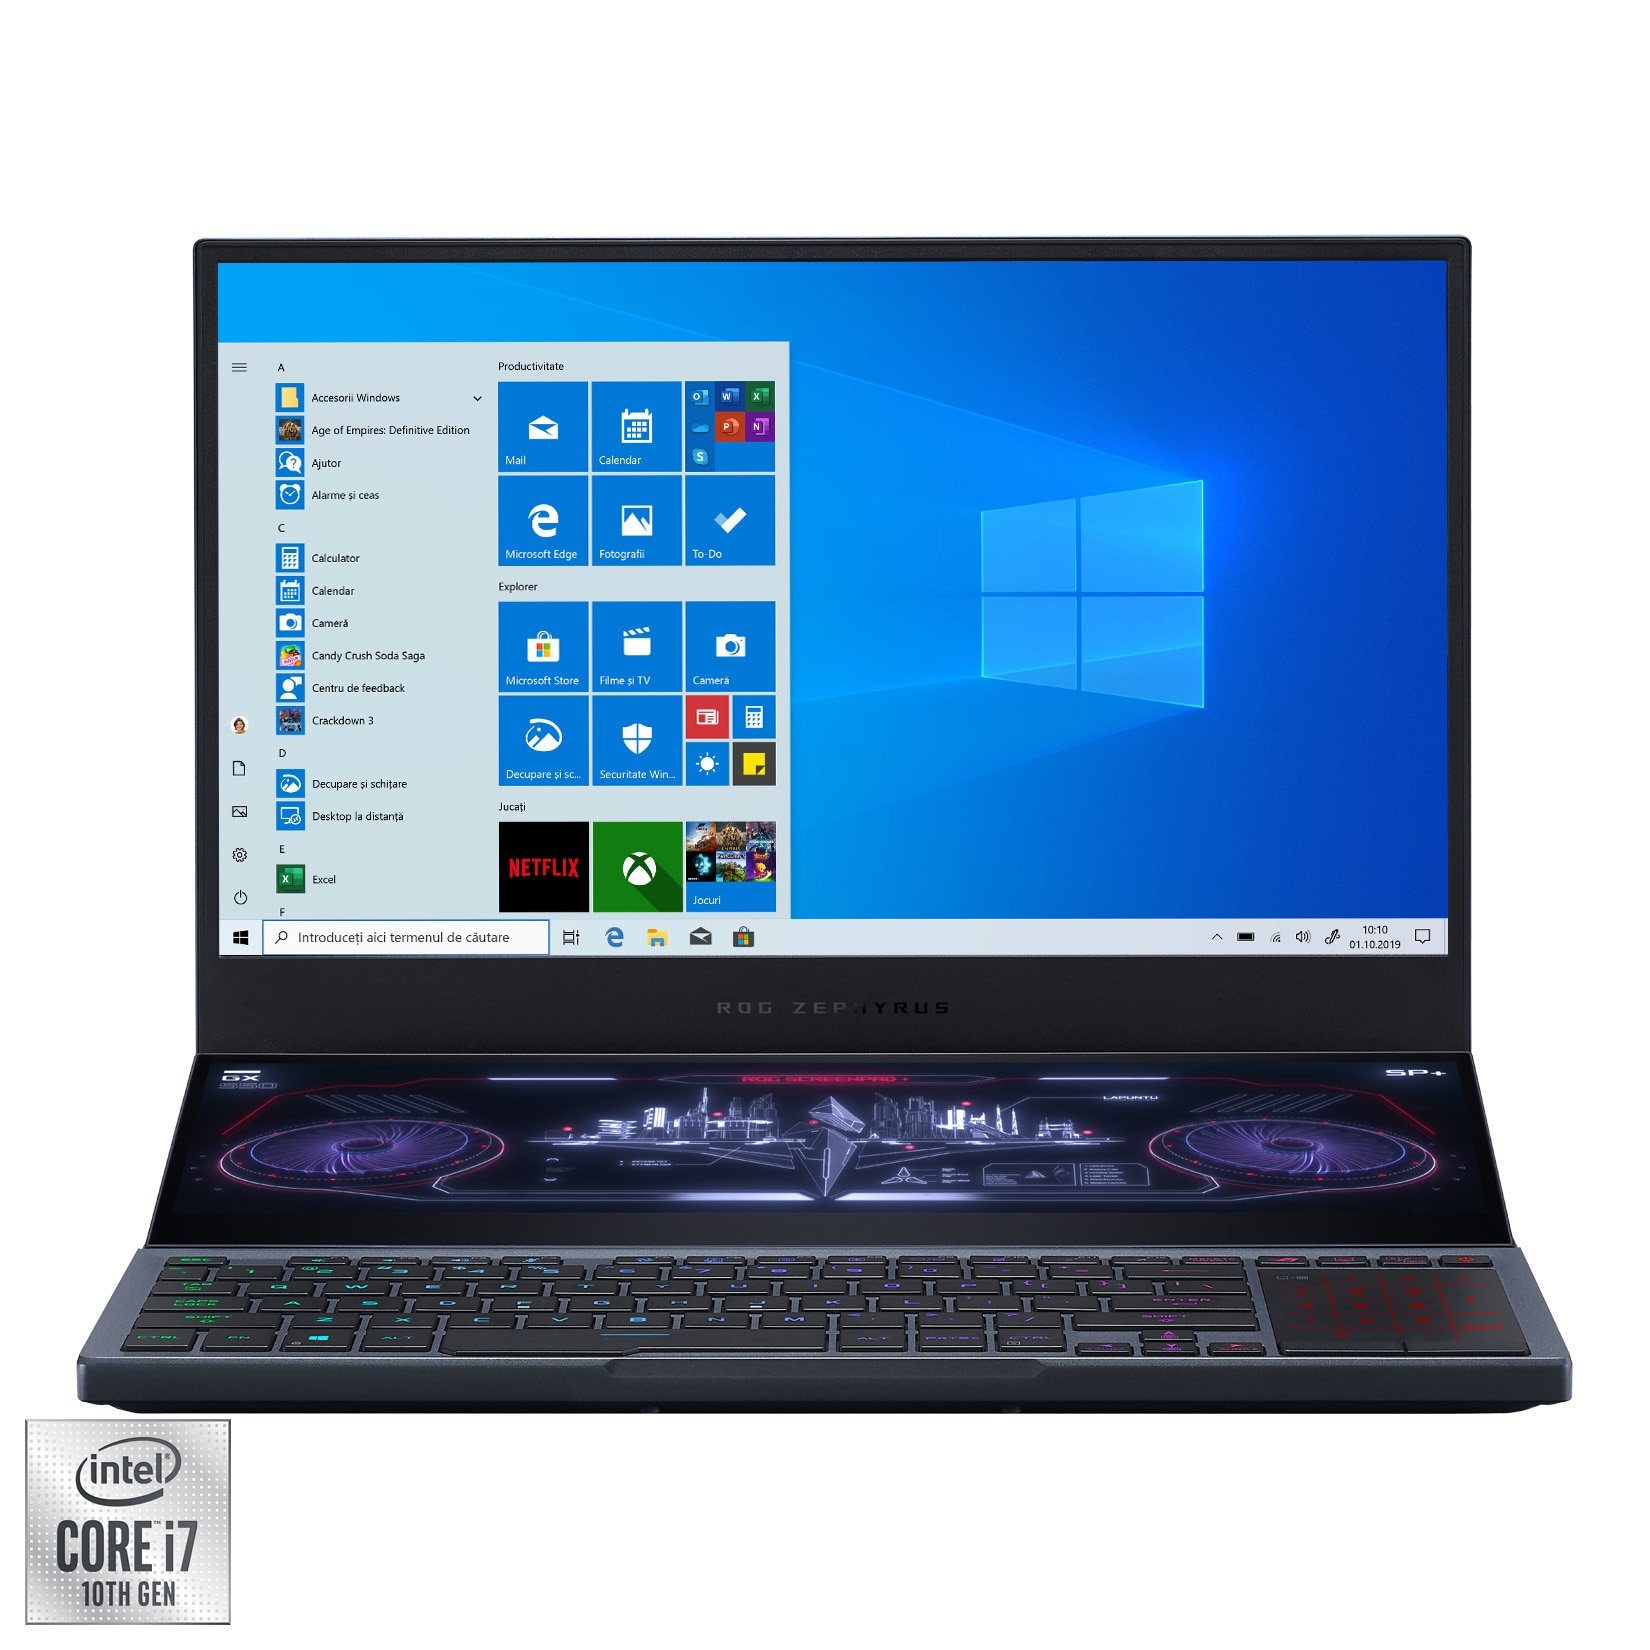 "Fotografie Laptop Gaming ASUS ROG Zephyrus Duo 15 cu procesor Intel® Core™ i7-10875H pana la 5.10 GHz, 15.6"", Full HD, 300Hz, 32GB, 1TB SSD, NVIDIA® GeForce RTX™ 2070 Super Max-Q 8GB, Windows 10 Home, Gunmetal Gray"